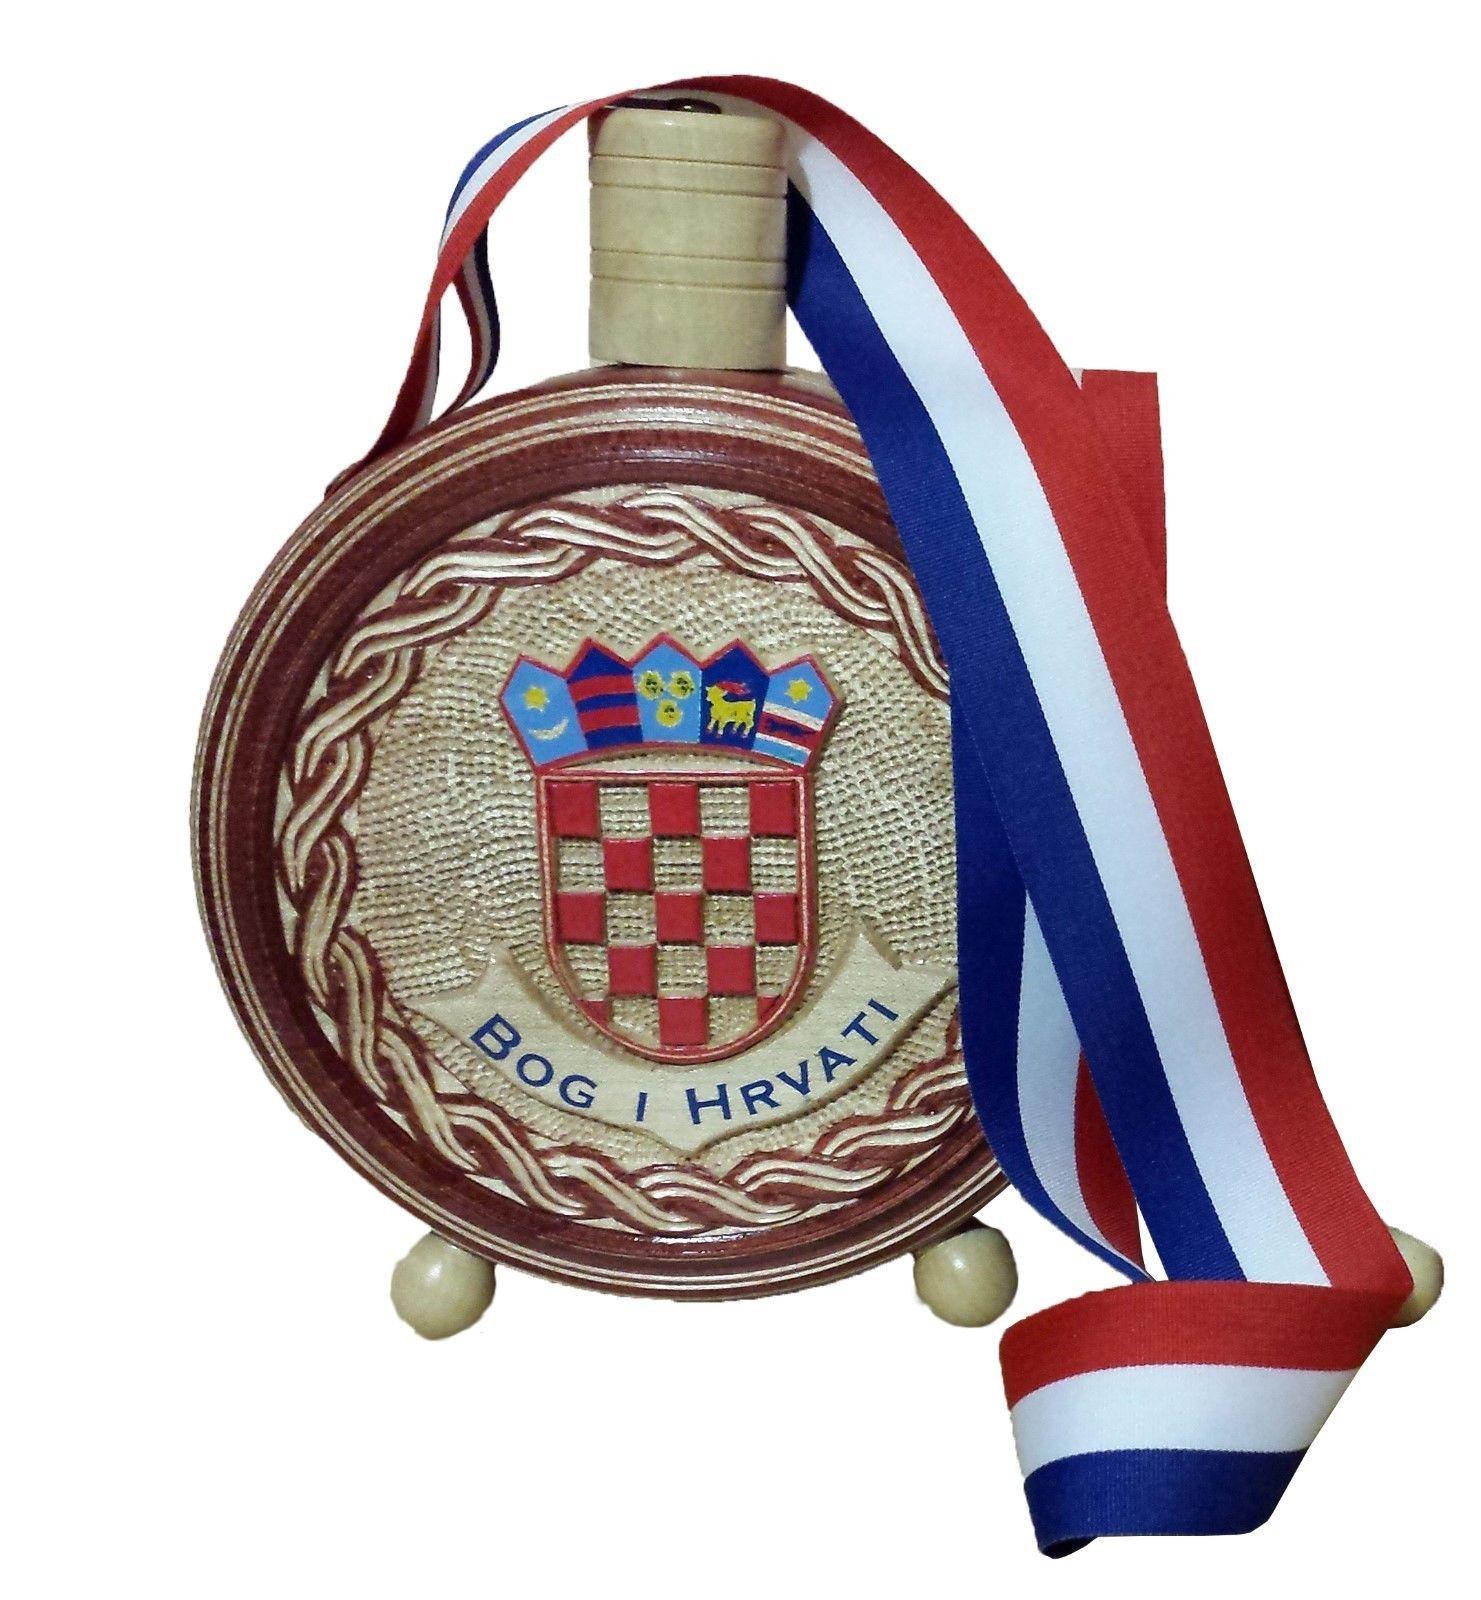 Croatian Cuturica New Grb Bog I Hrvati Wooden Flask Handcrafted 500ml Handcraft Auction Gift Basket Ideas Flask